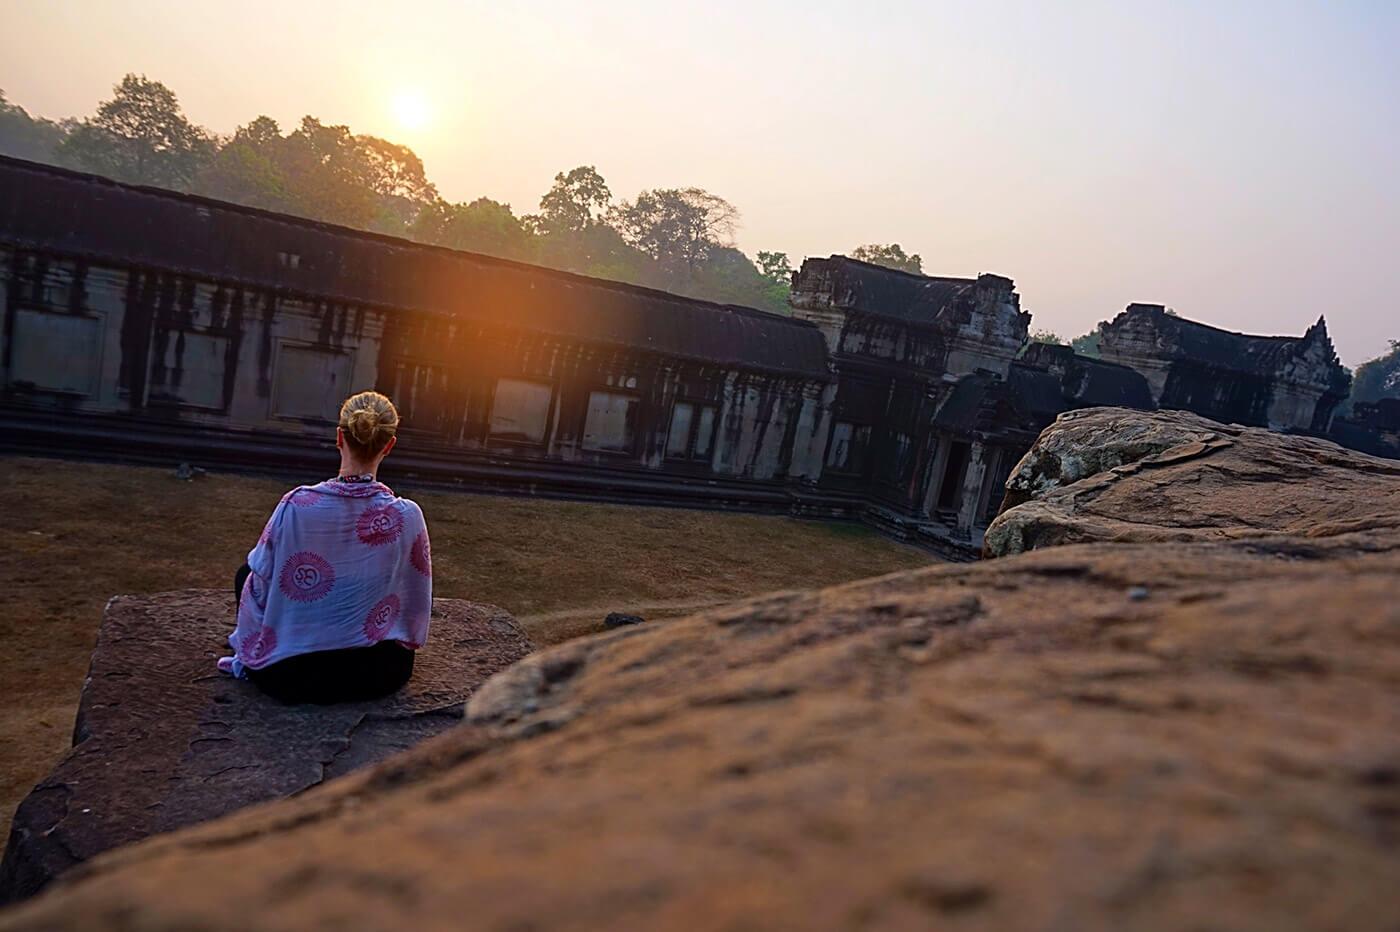 manaste-nainen-meditoi-auringonnousussa